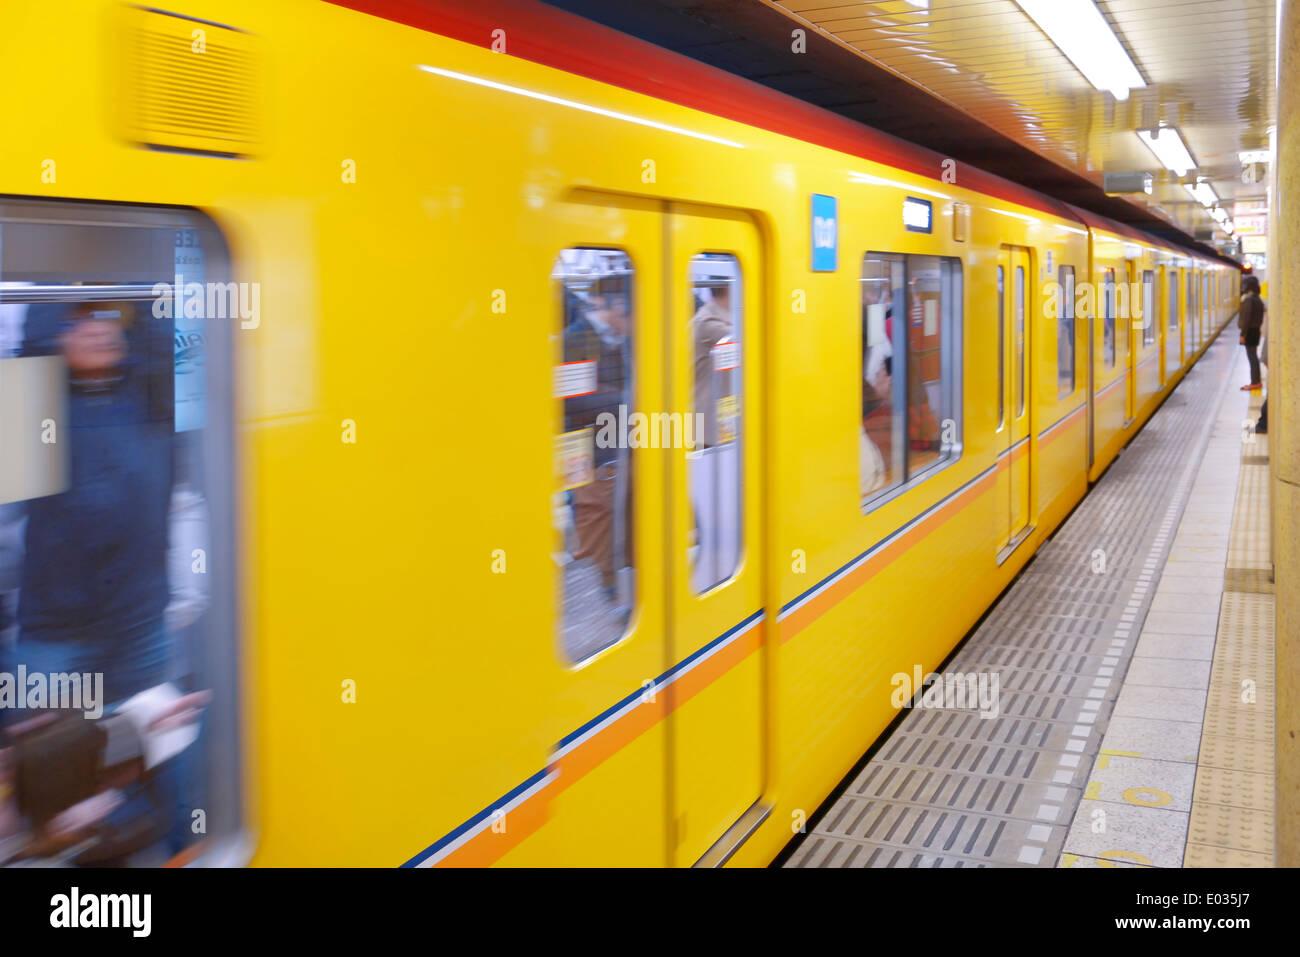 Tokyo Metro yellow subway train arriving to a subway station platform. Tokyo, Japan. - Stock Image